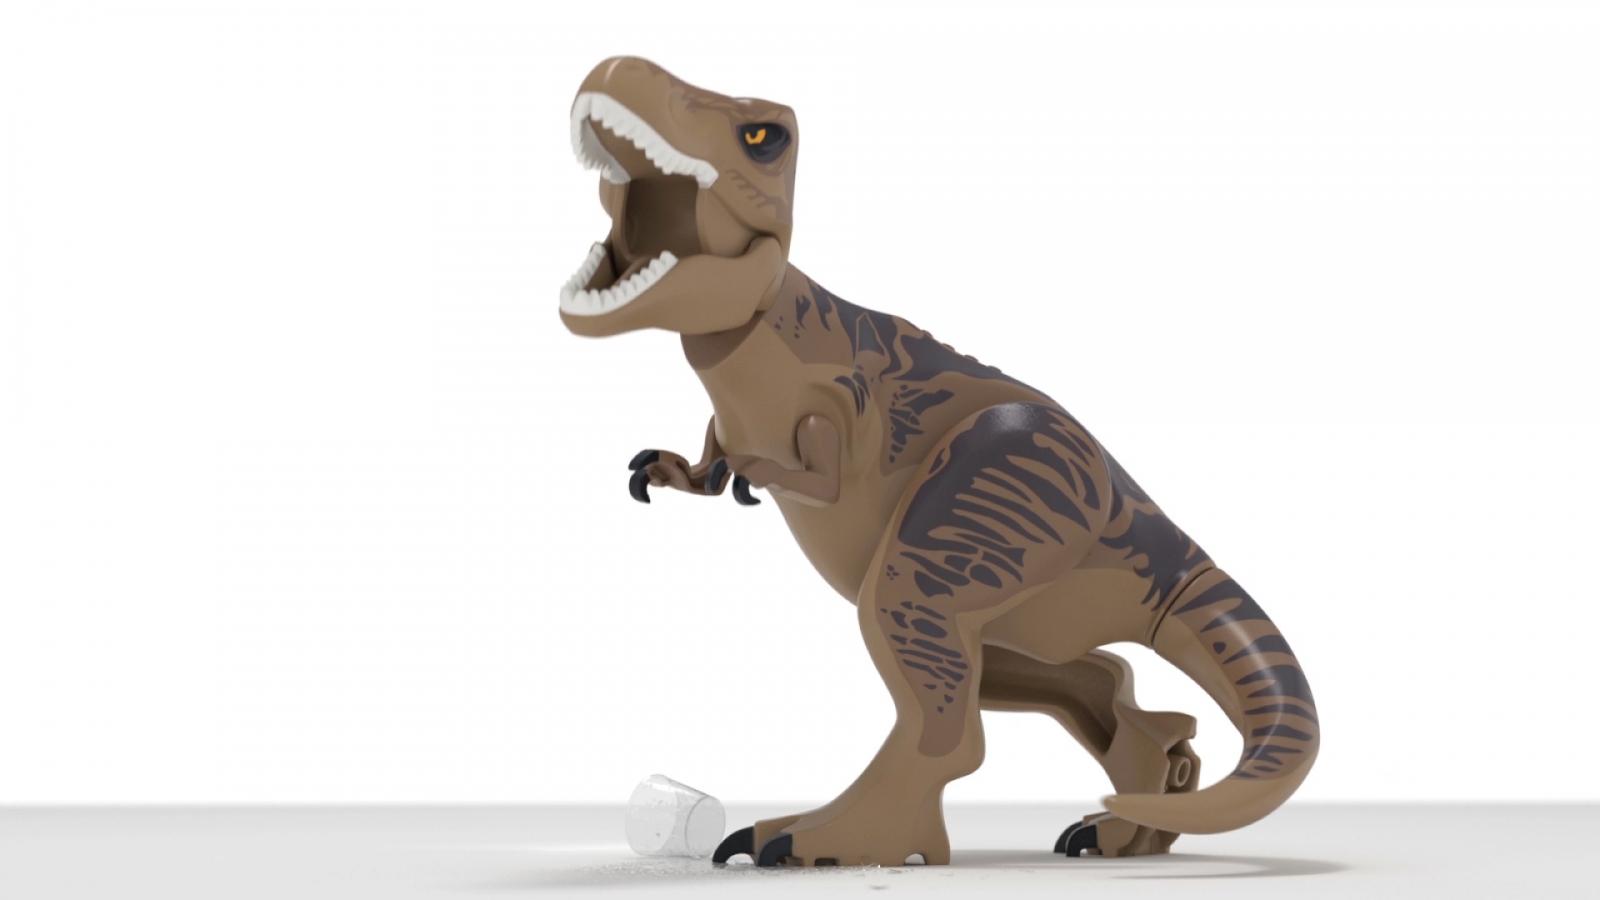 First Lego Jurassic World teaser trailer promises four films-worth of adventure